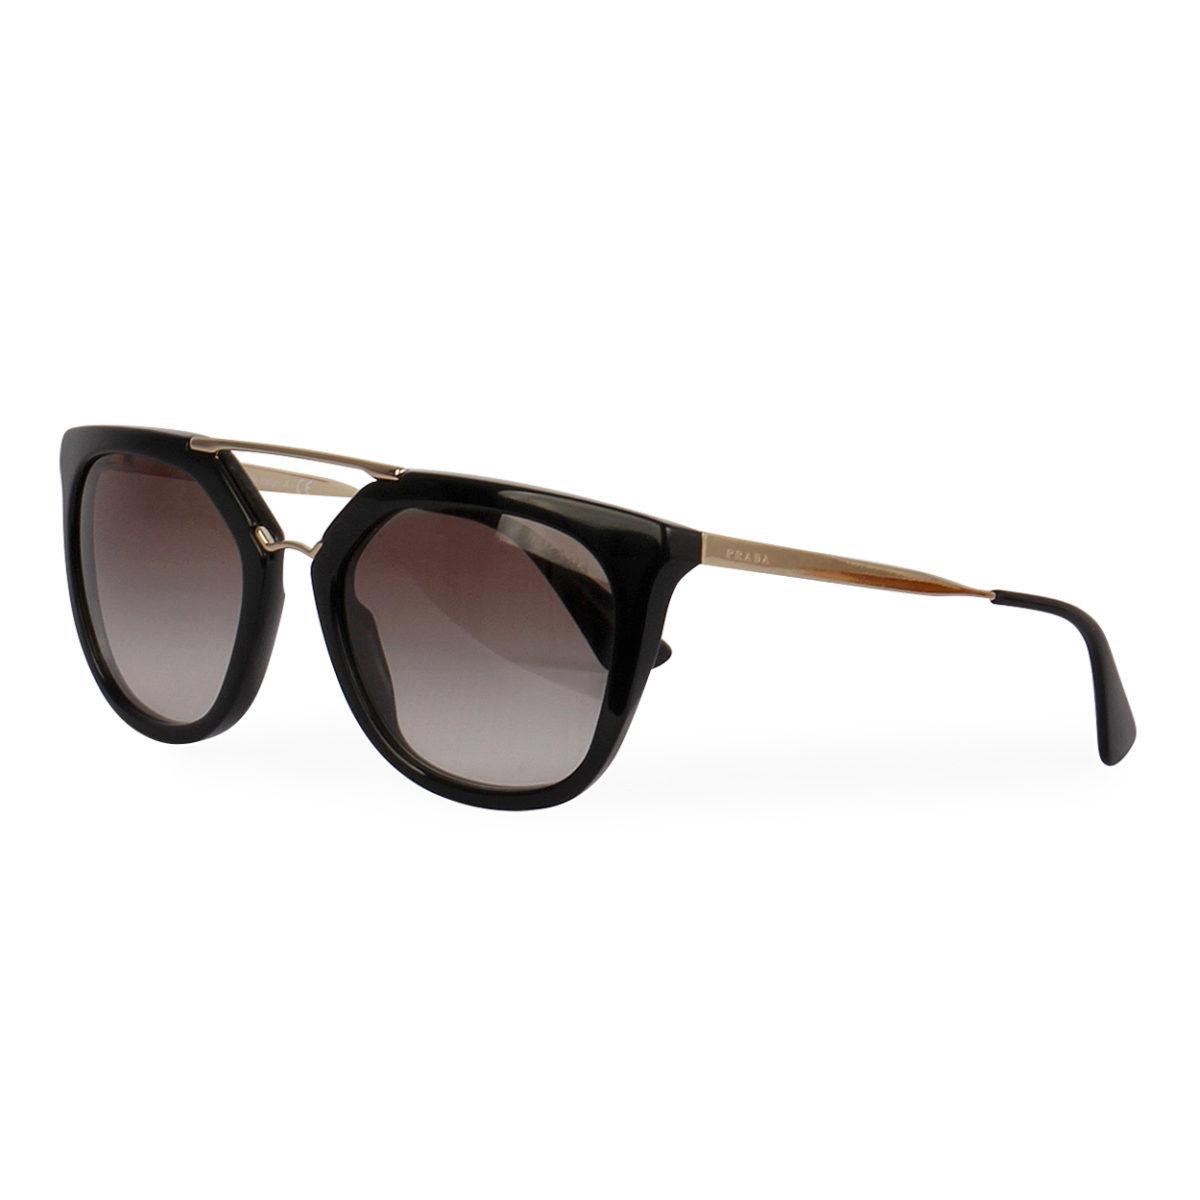 2ab4aa559de purchase prada catwalk sunglasses f9502 d80f5